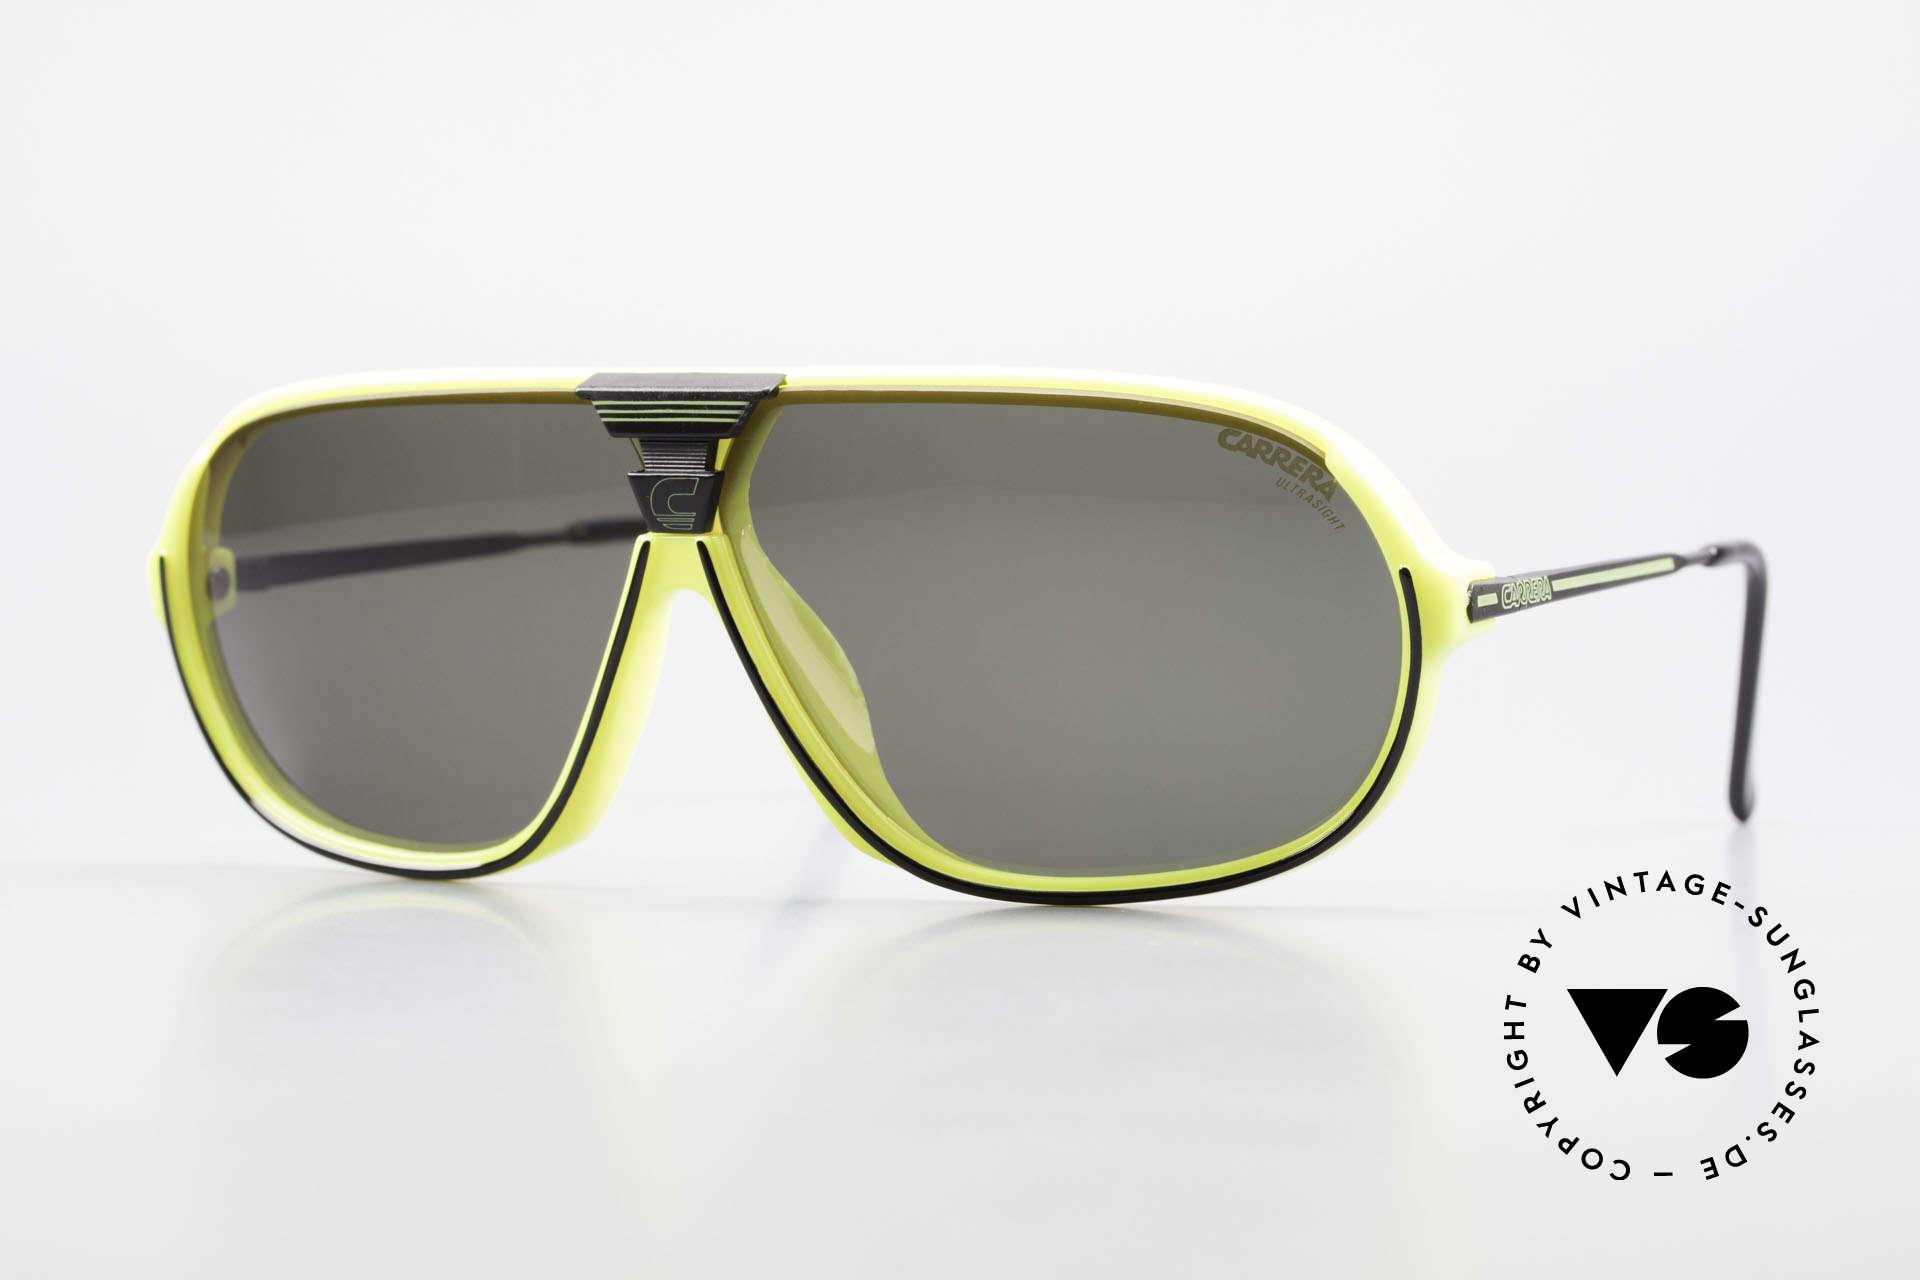 Carrera 5416 80's Shades Polarized Lenses, sensational sports shades by Carrera from 1988, Made for Men